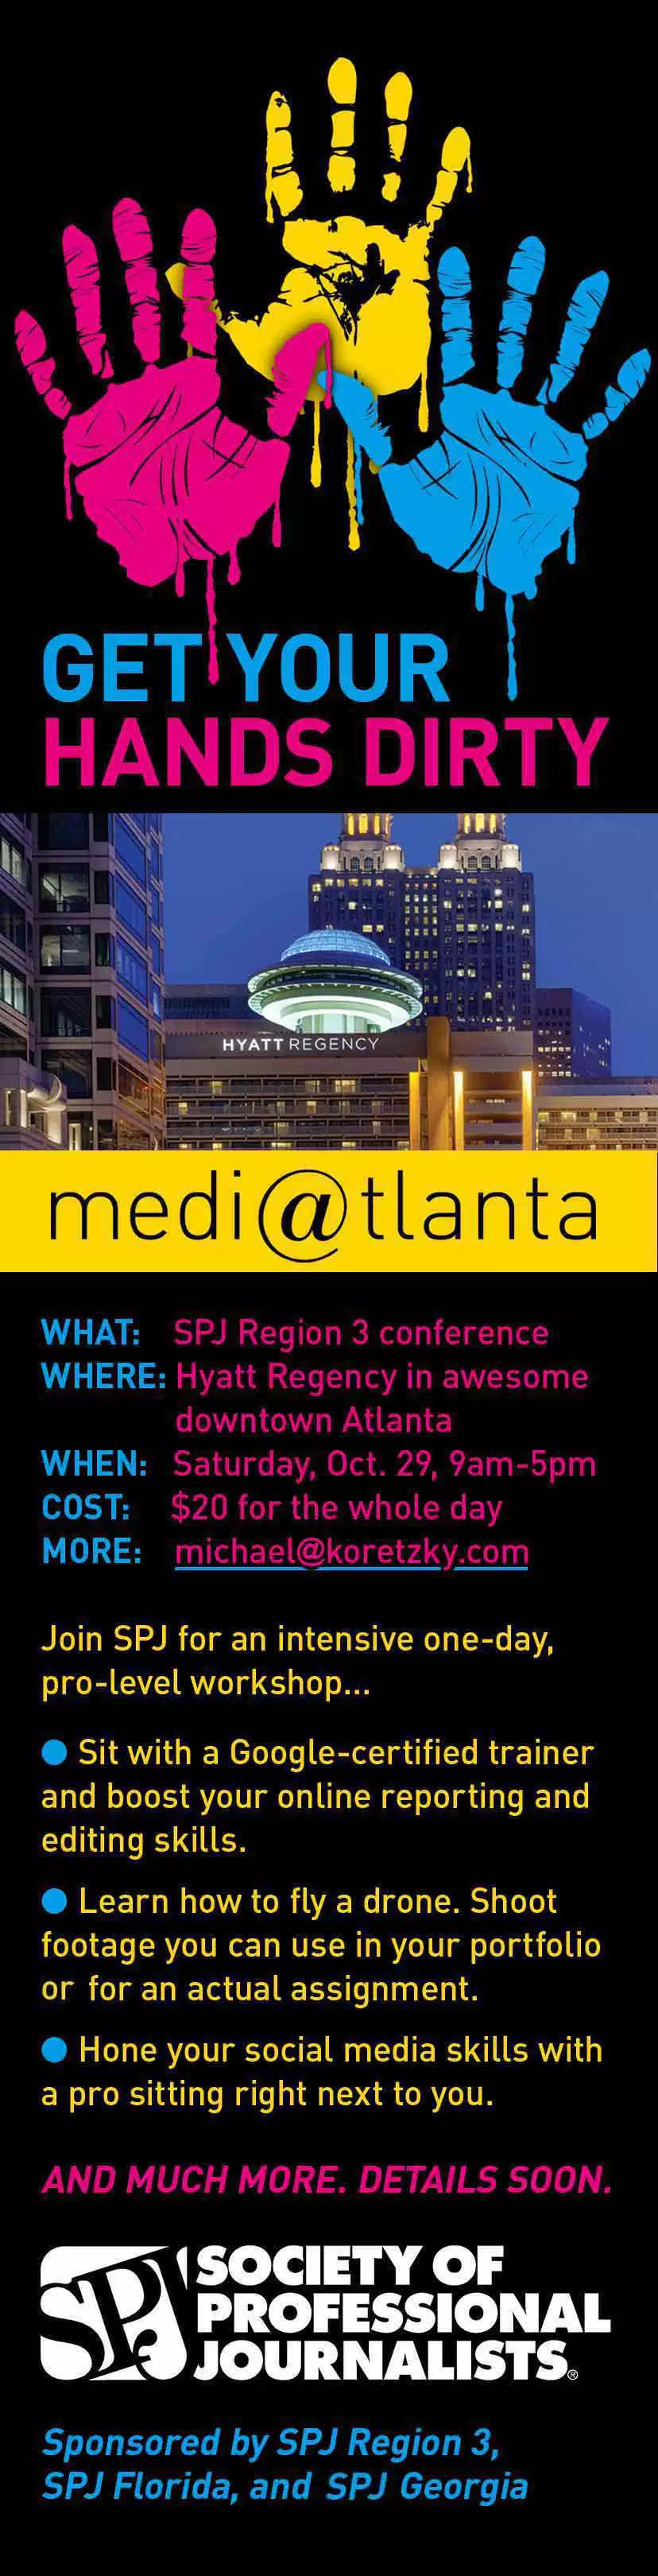 2016 Region 3 conference in Atlanta